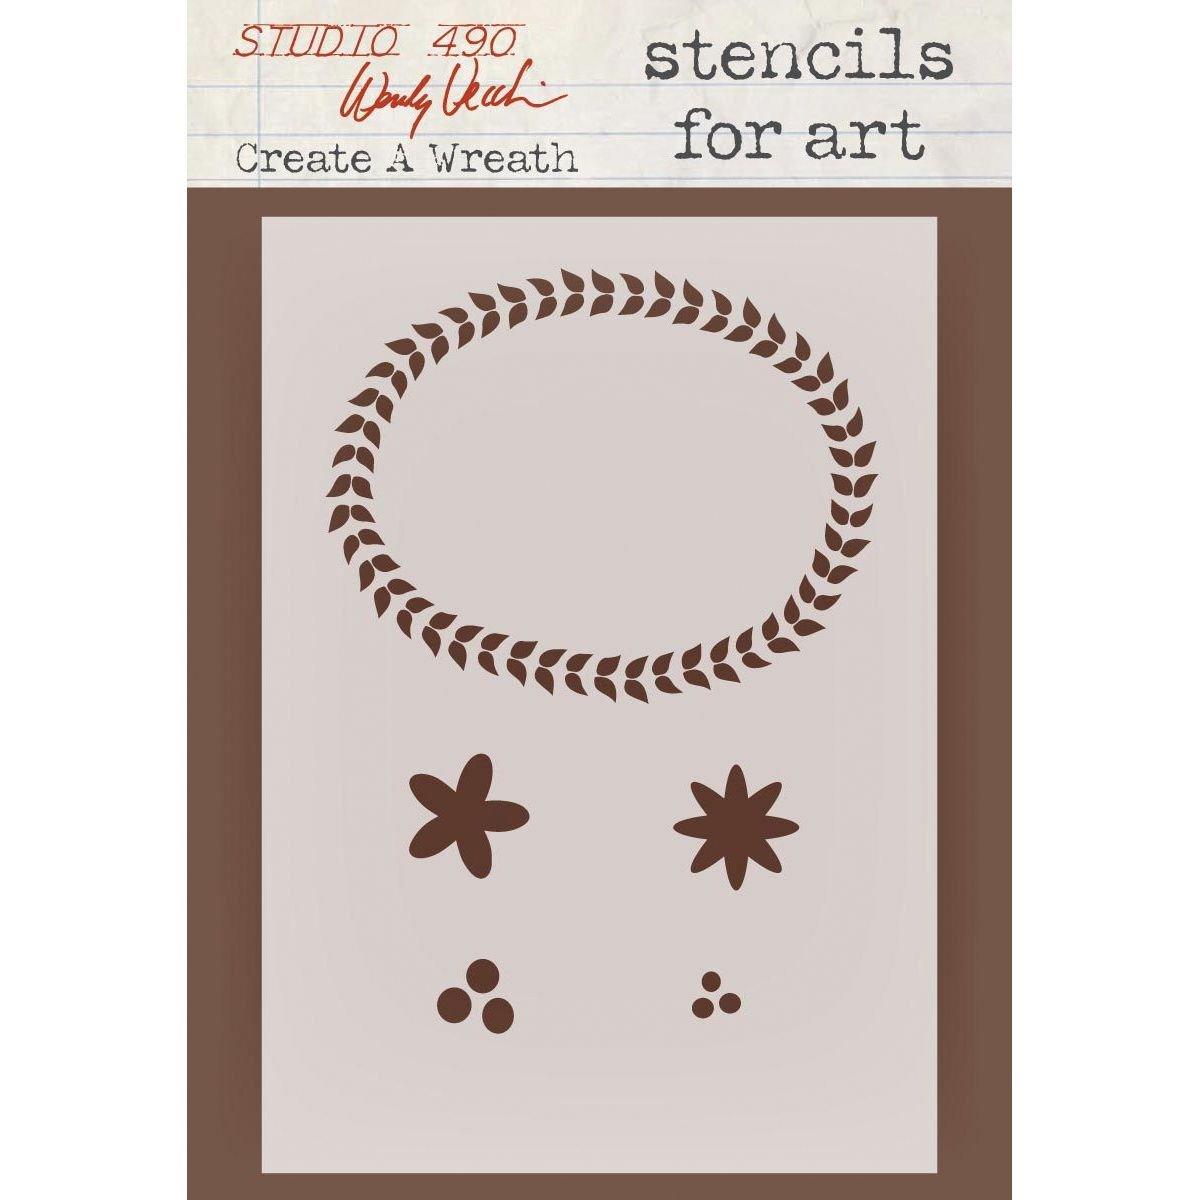 Studio 490 - Create a Wreath Stencil